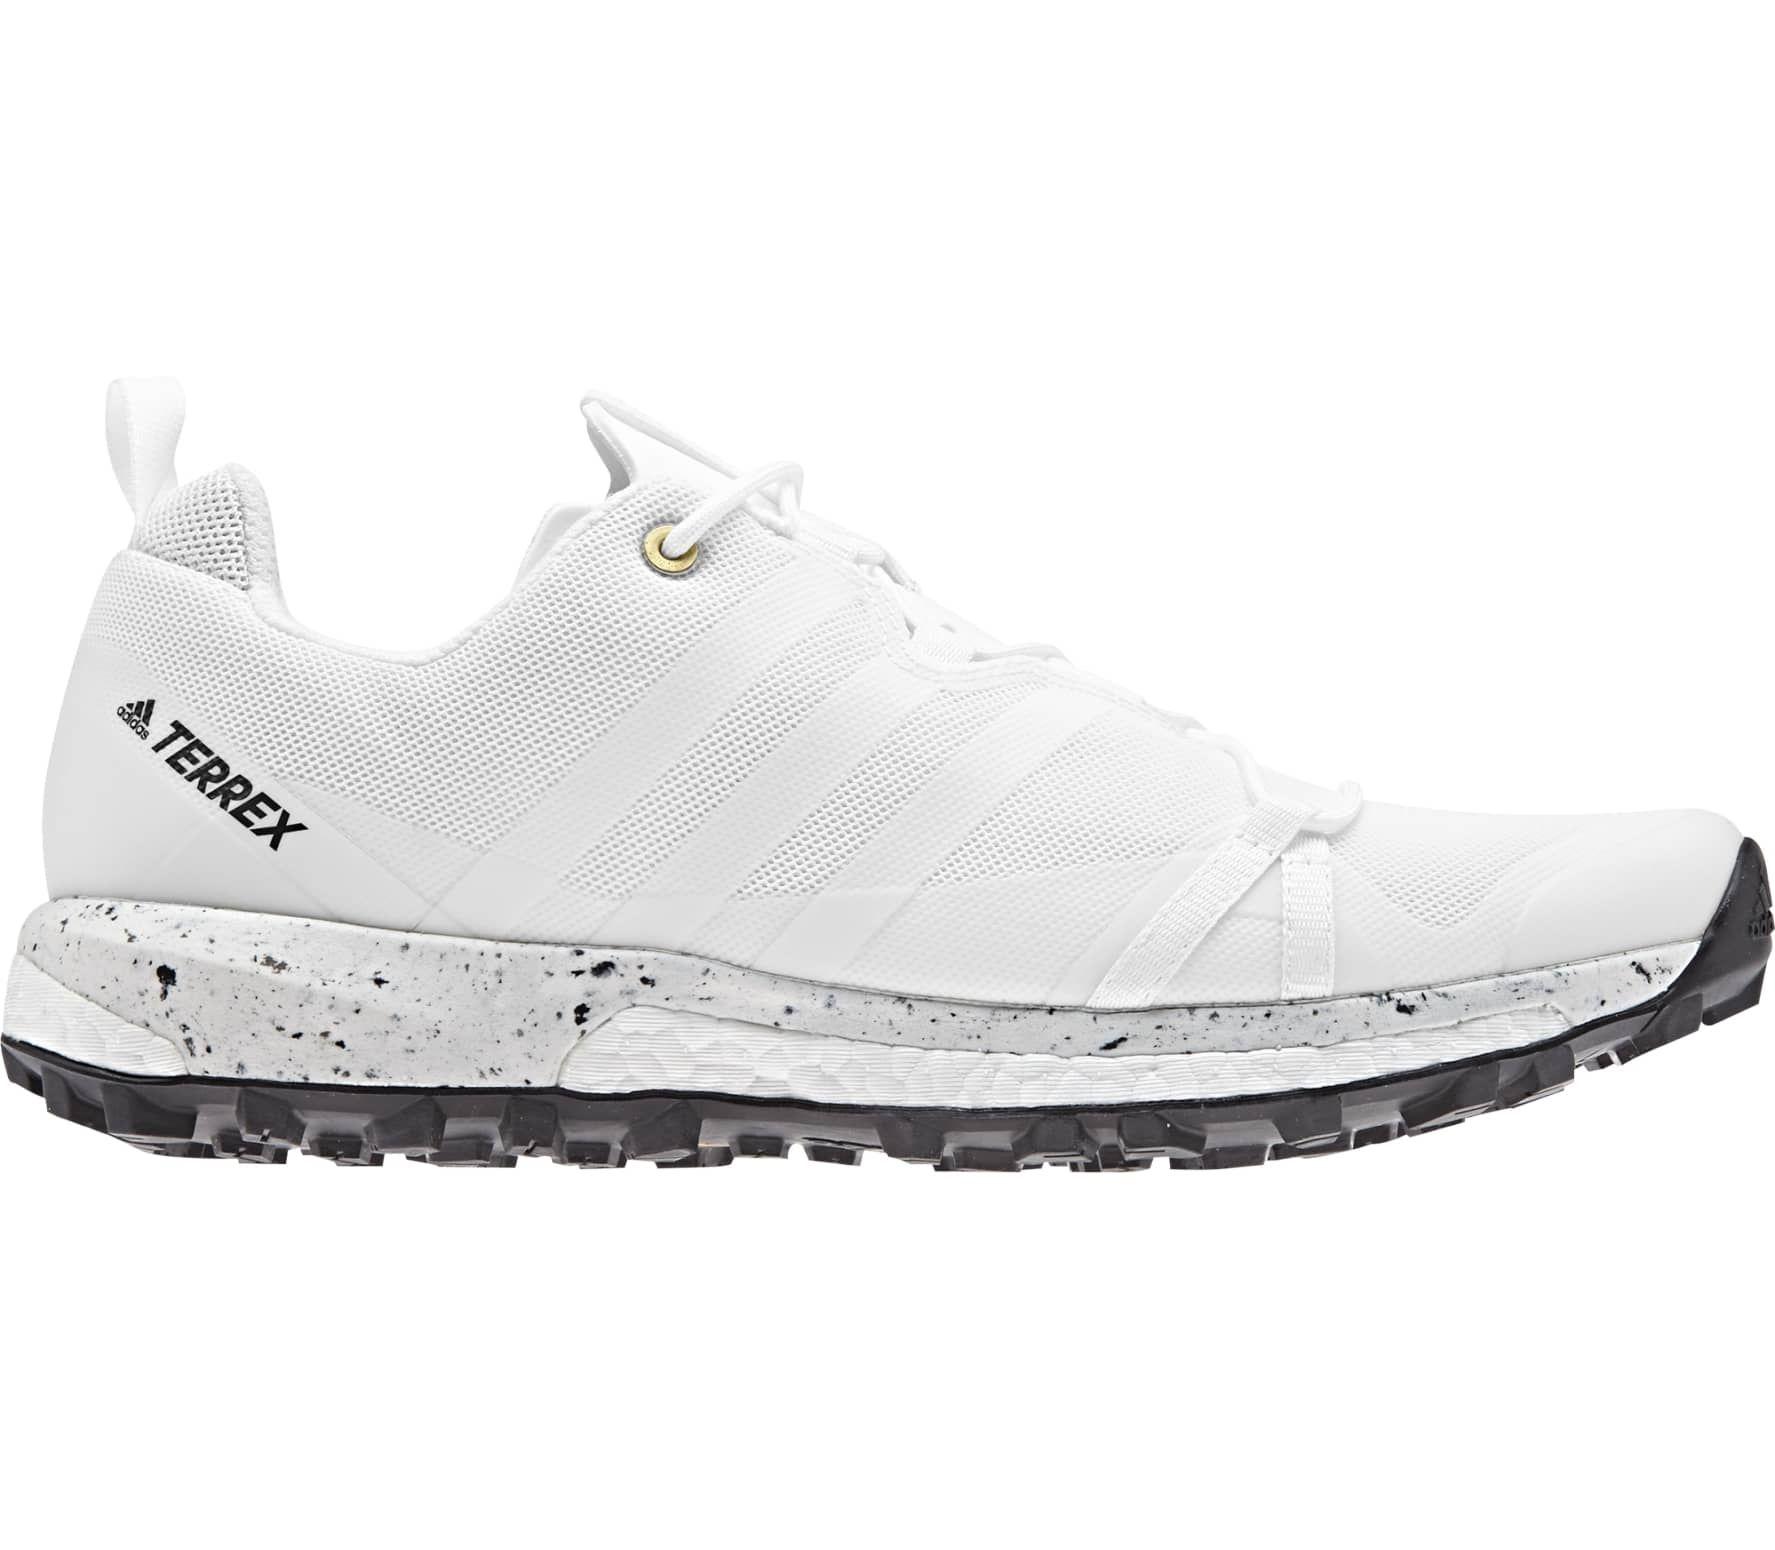 SchuheDamen Herren WeißSchuhe Terrex Agravic Adidas j35q4ARcL